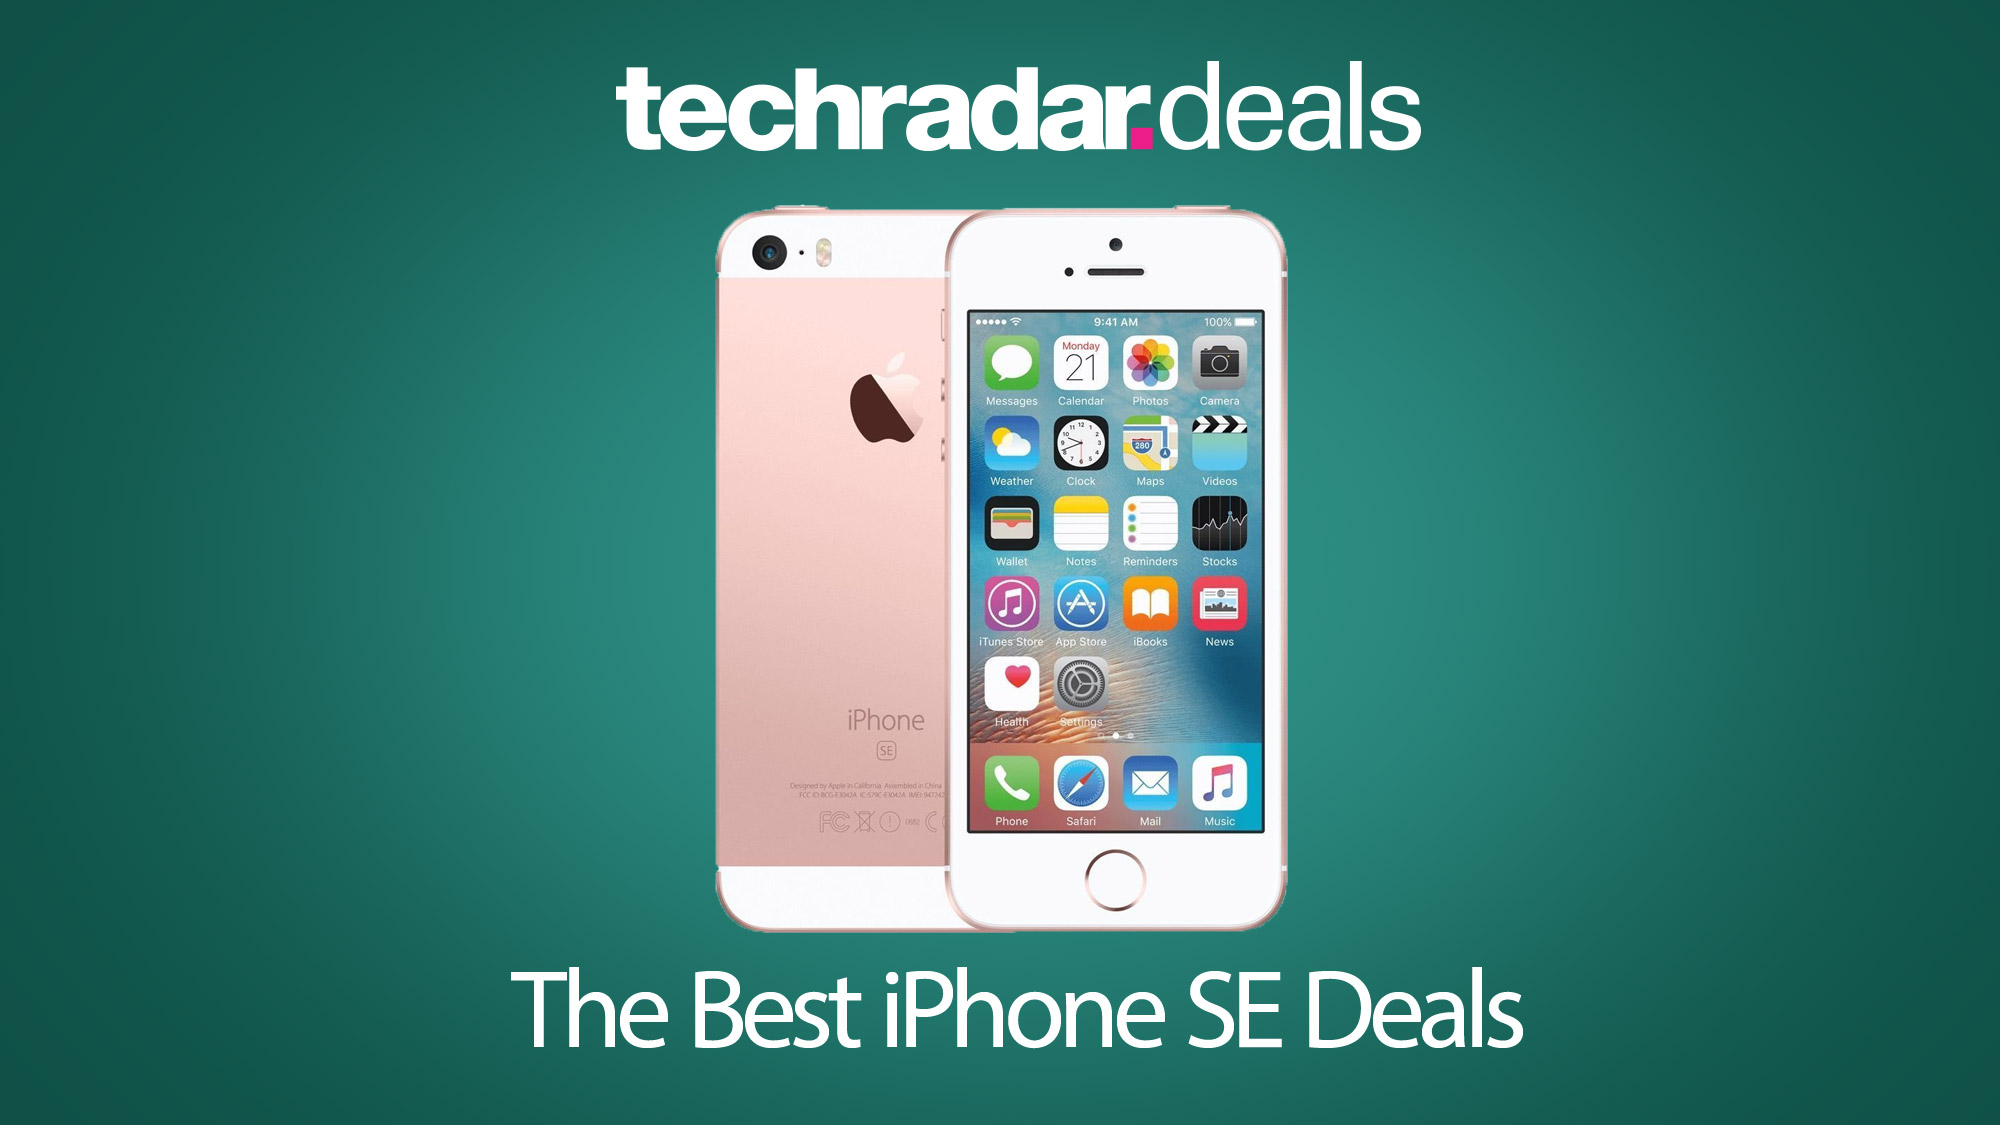 The best iPhone SE deals in September 2019 | TechRadar